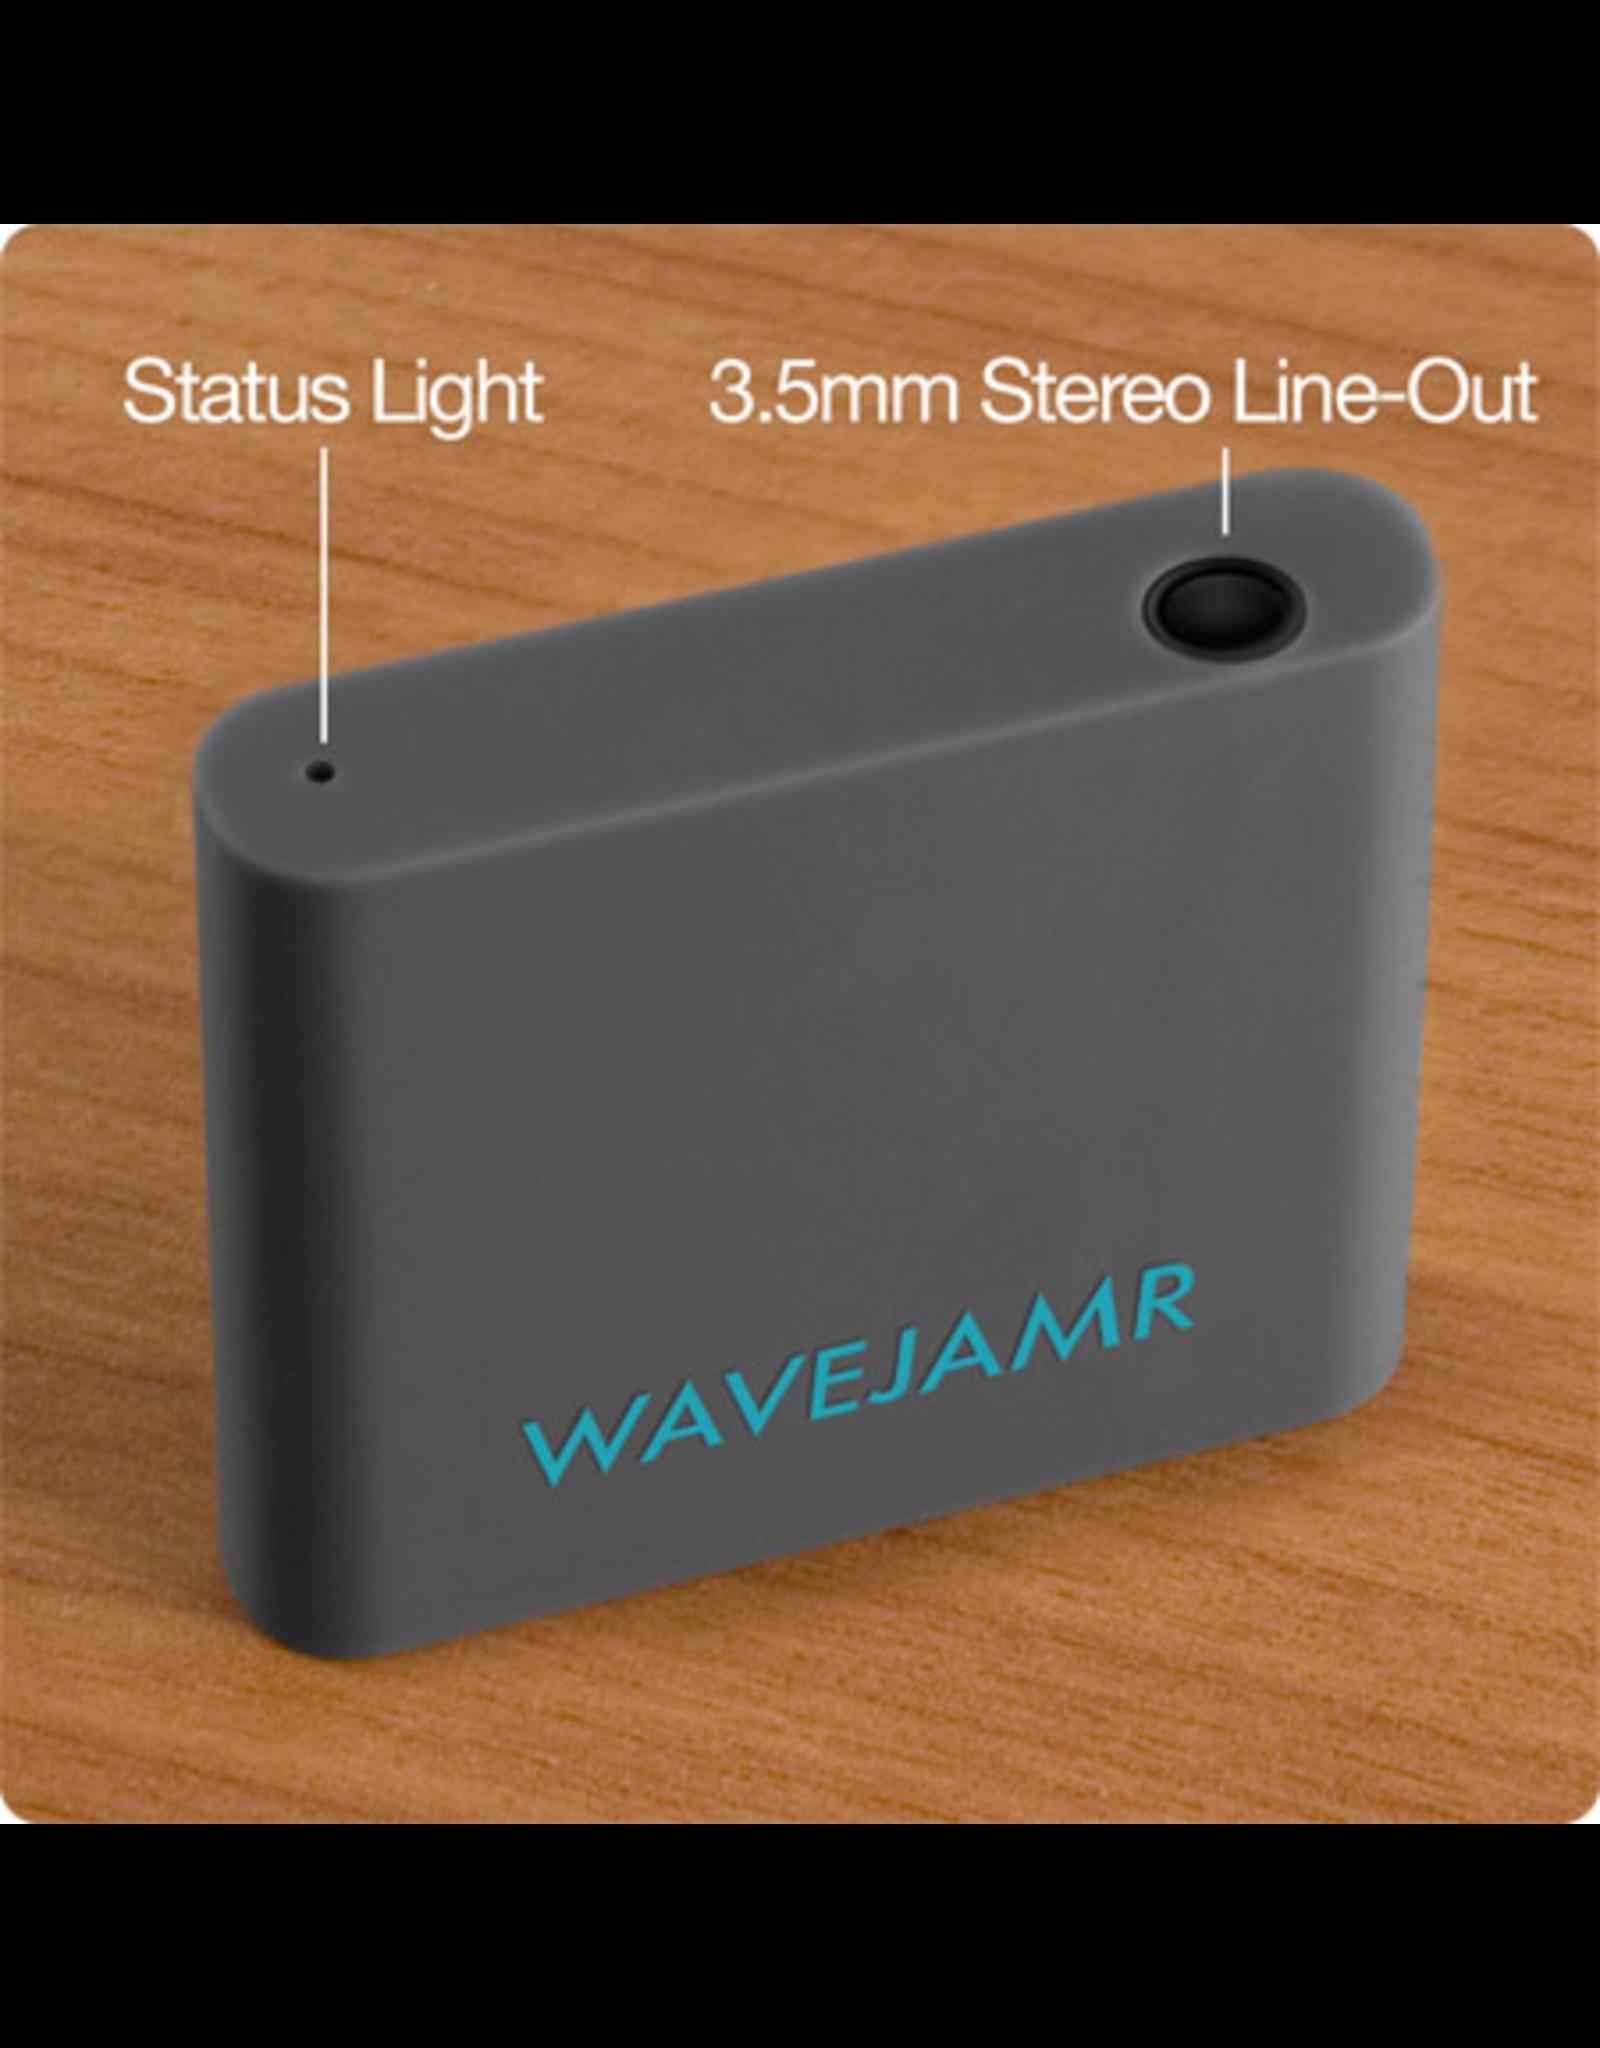 Radtech Radtech - WaveJamr 5 Bluetooth Audio Receiver with line out